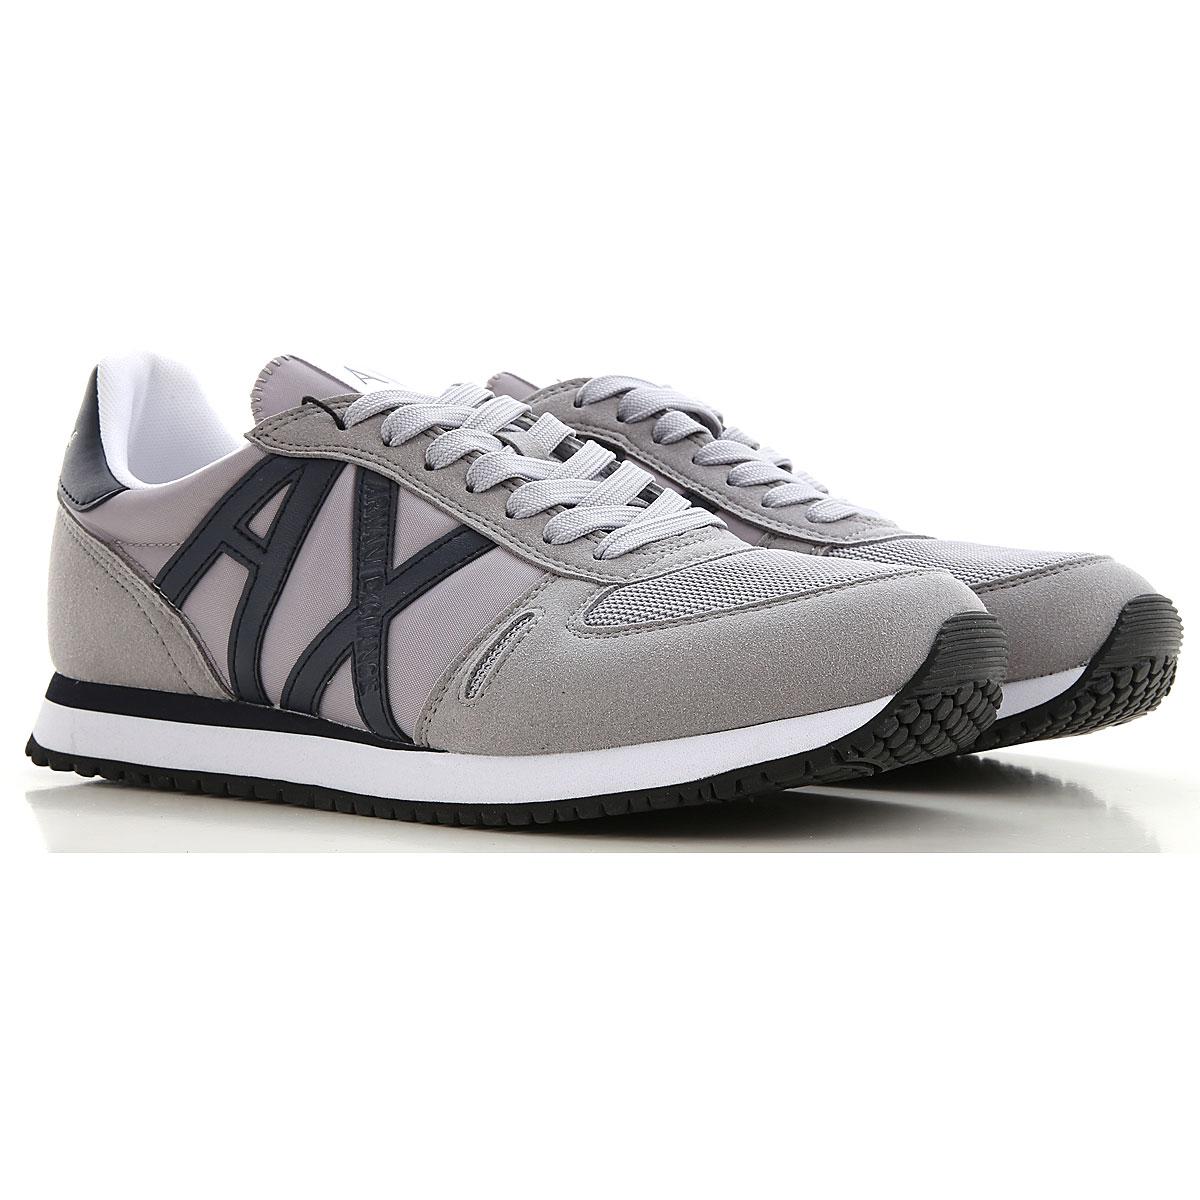 Armani Exchange Sneakers for Men On Sale, Grey, polyester, 2019, UK 11 - EUR 45 - US 12 UK 12 - EUR 46 - US 13